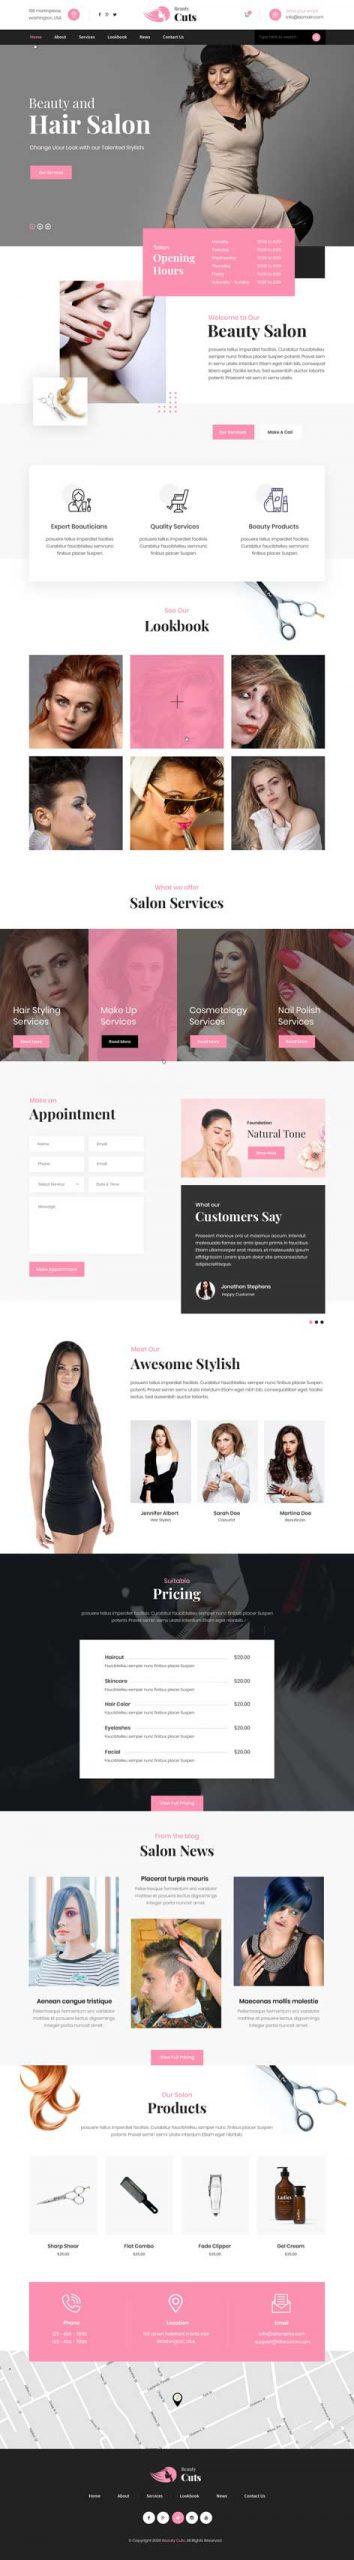 hair salon and hairstyle WordPress theme